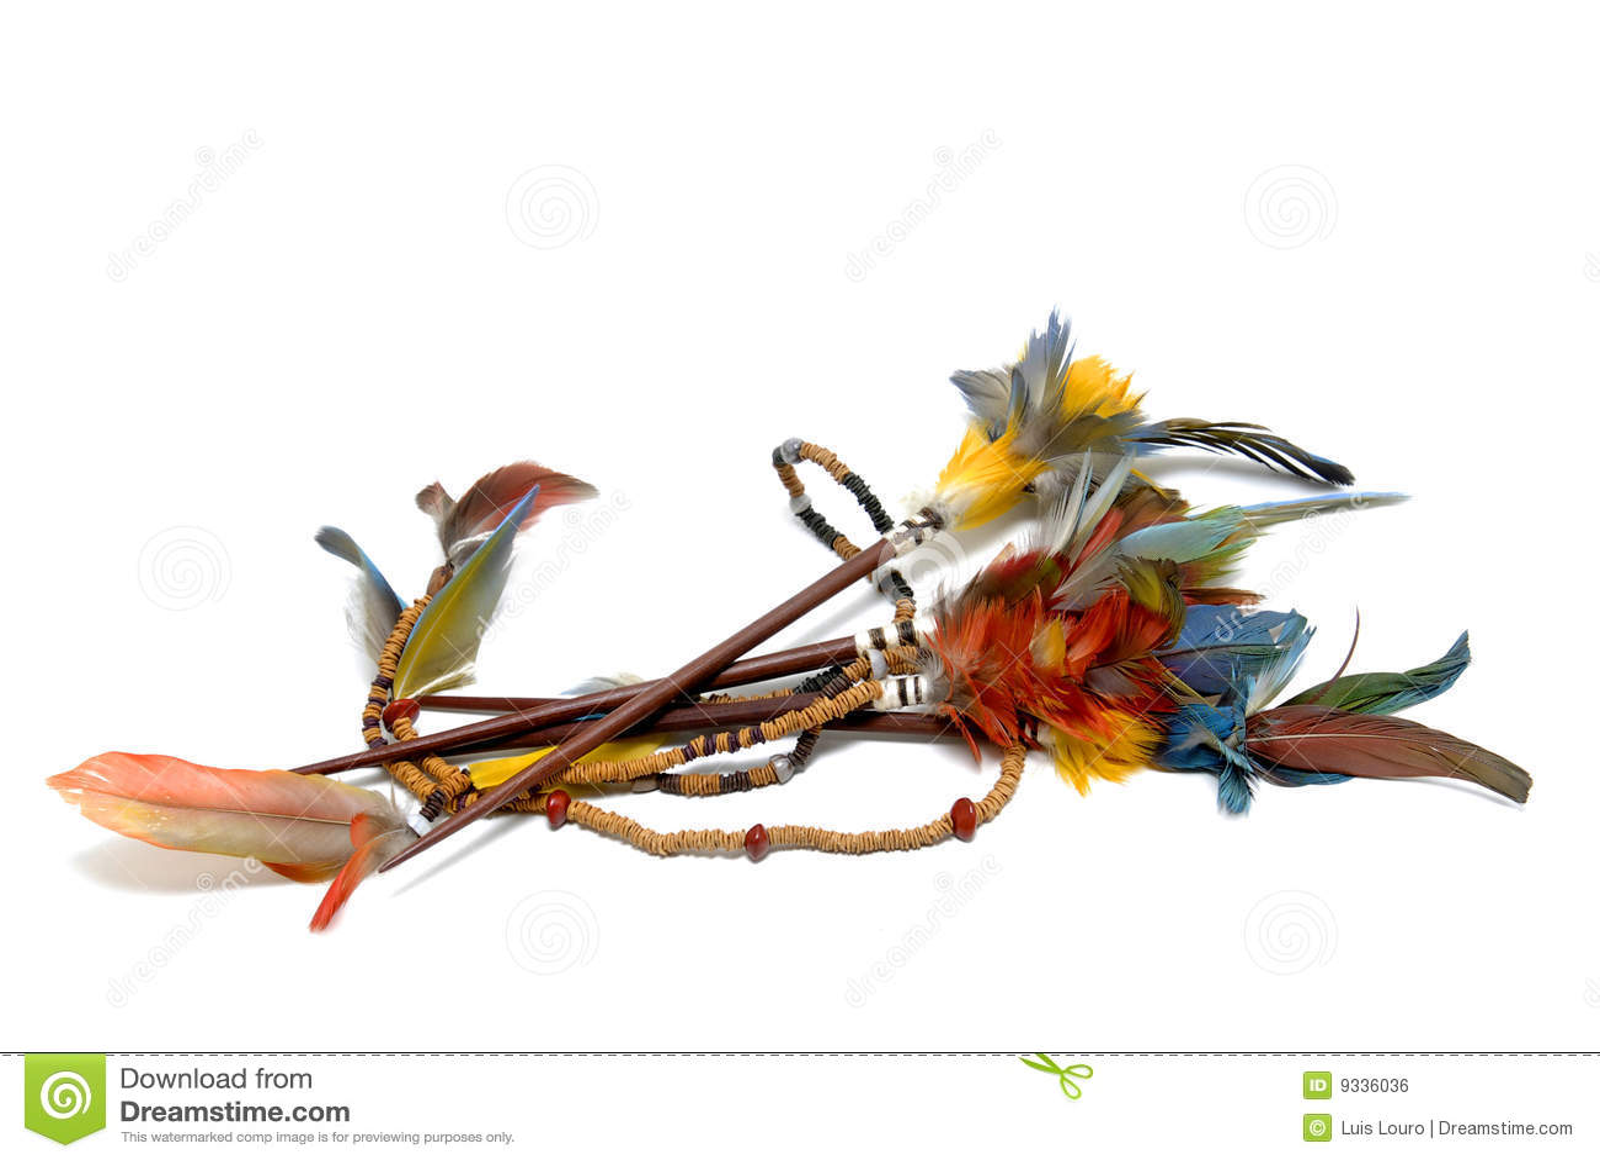 Plumas indias foto de archivo. Imagen de colorido, américa - 9336036